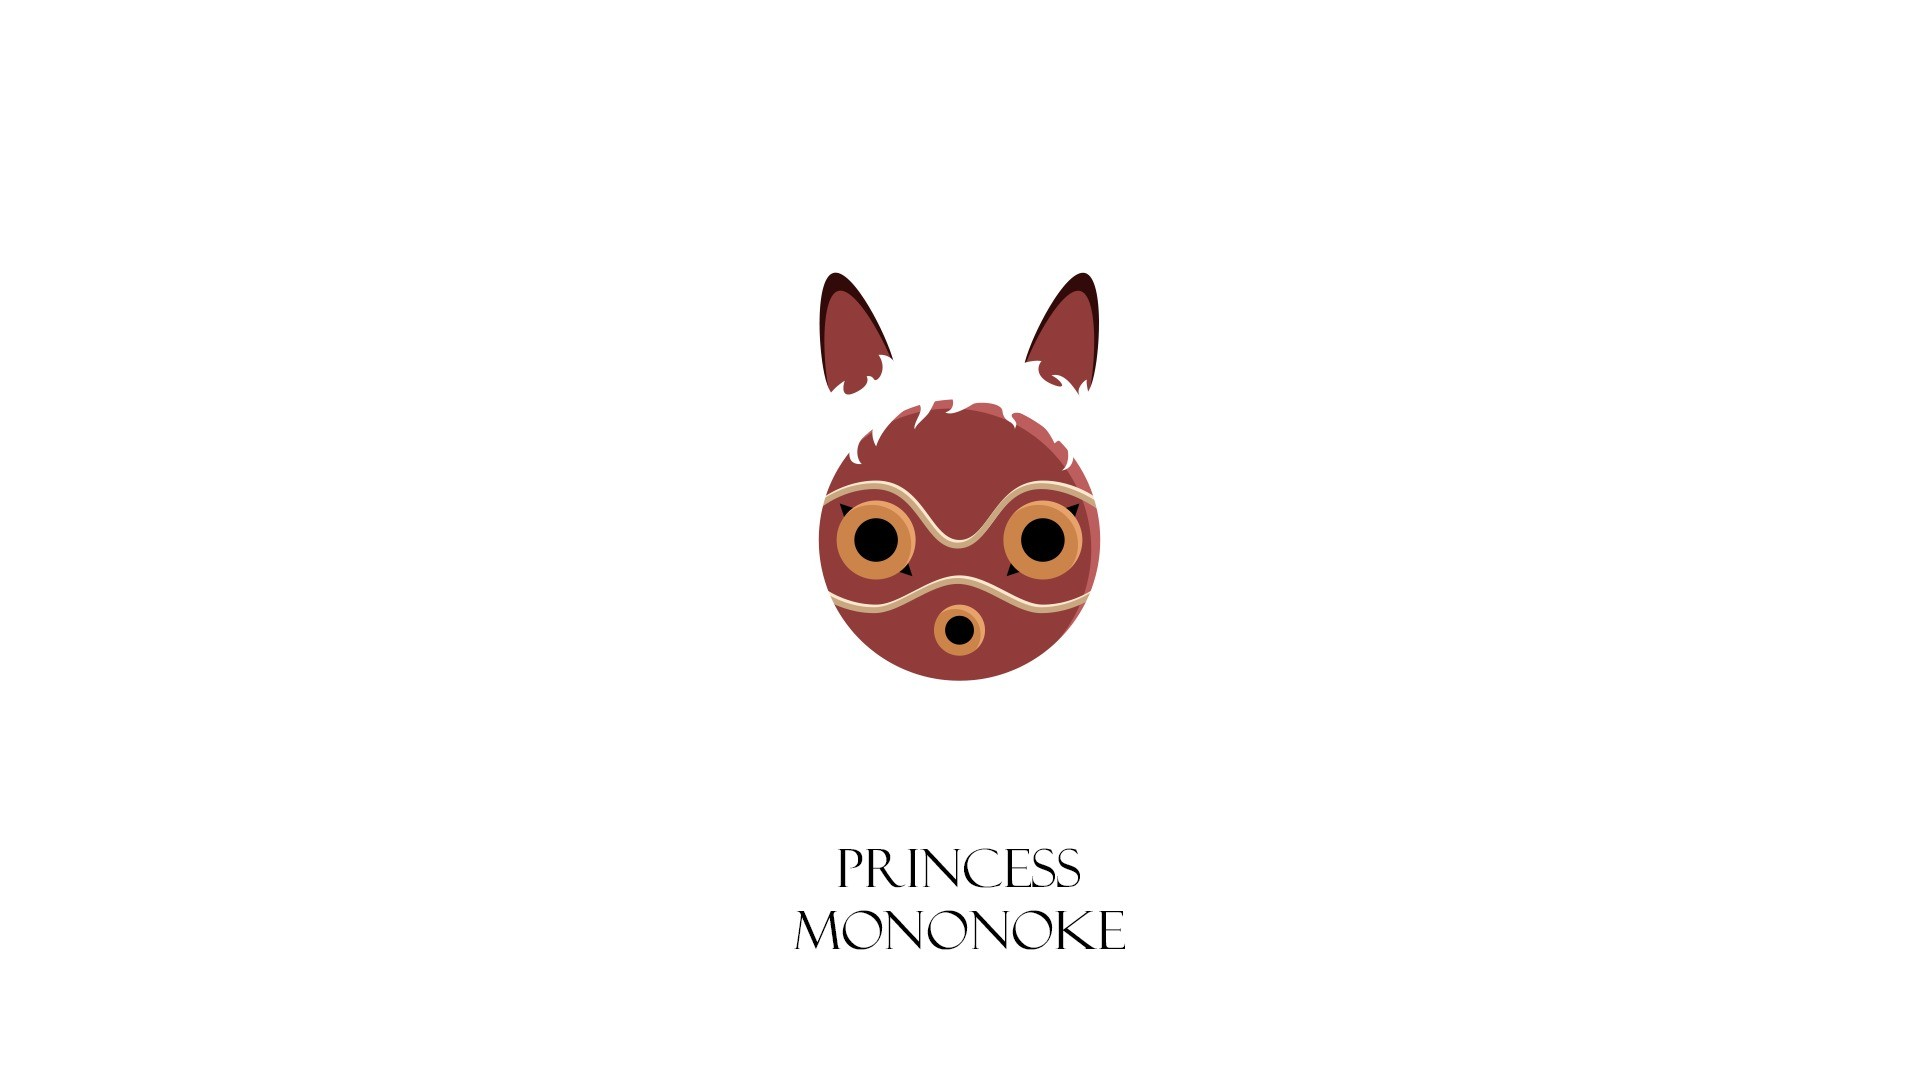 Made a Princess Mononoke wallpaper